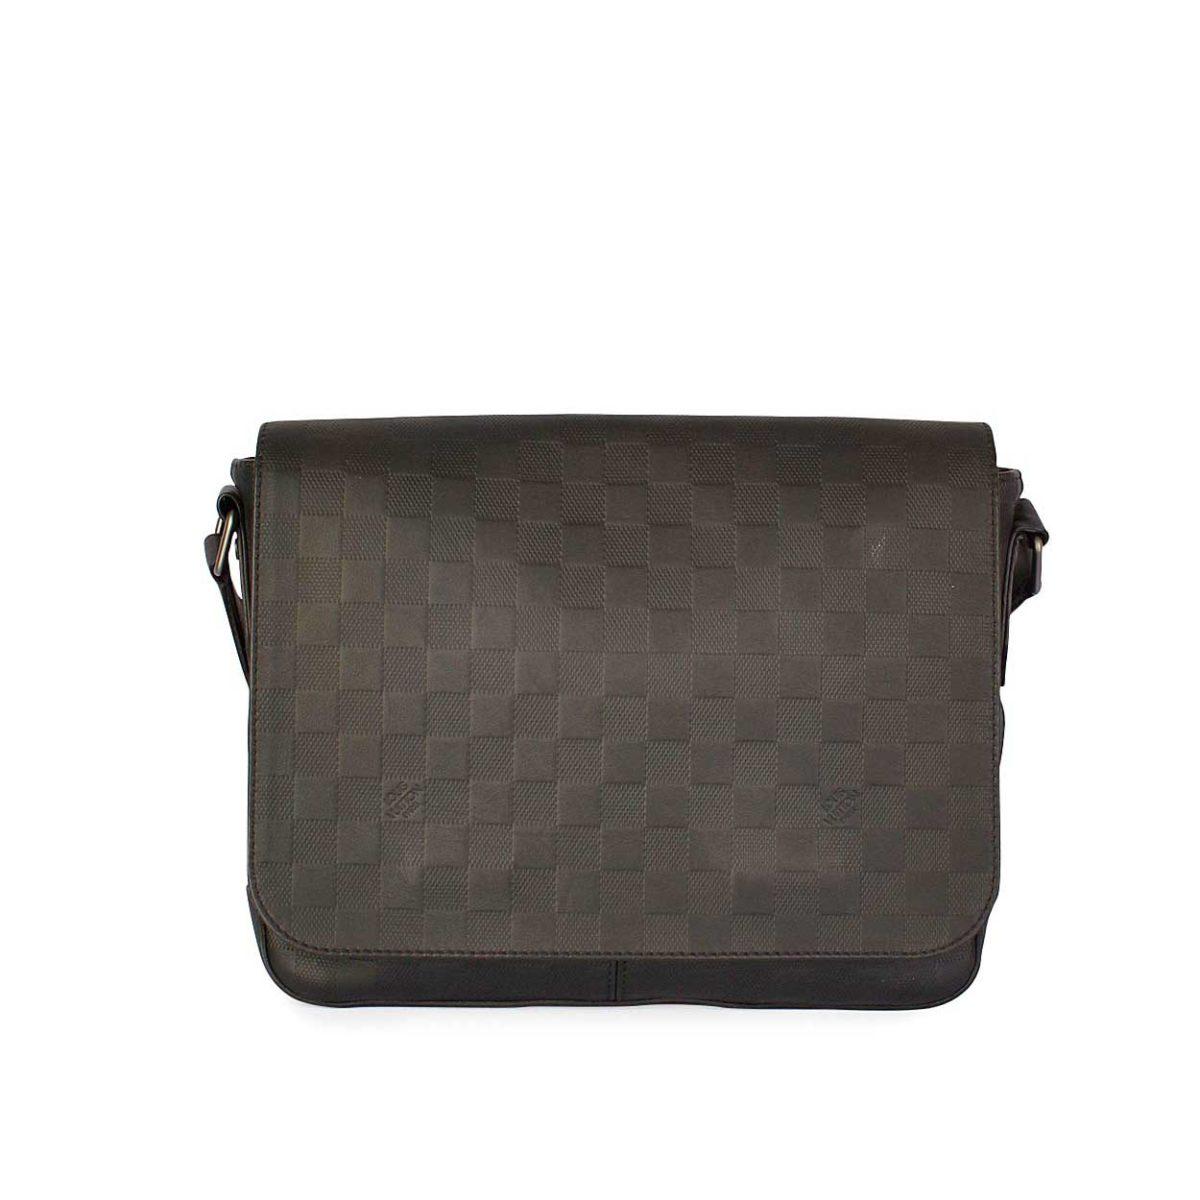 Louis Vuitton Damier Infini District Mm Messenger Bag 2 555 00 1 095 Loading